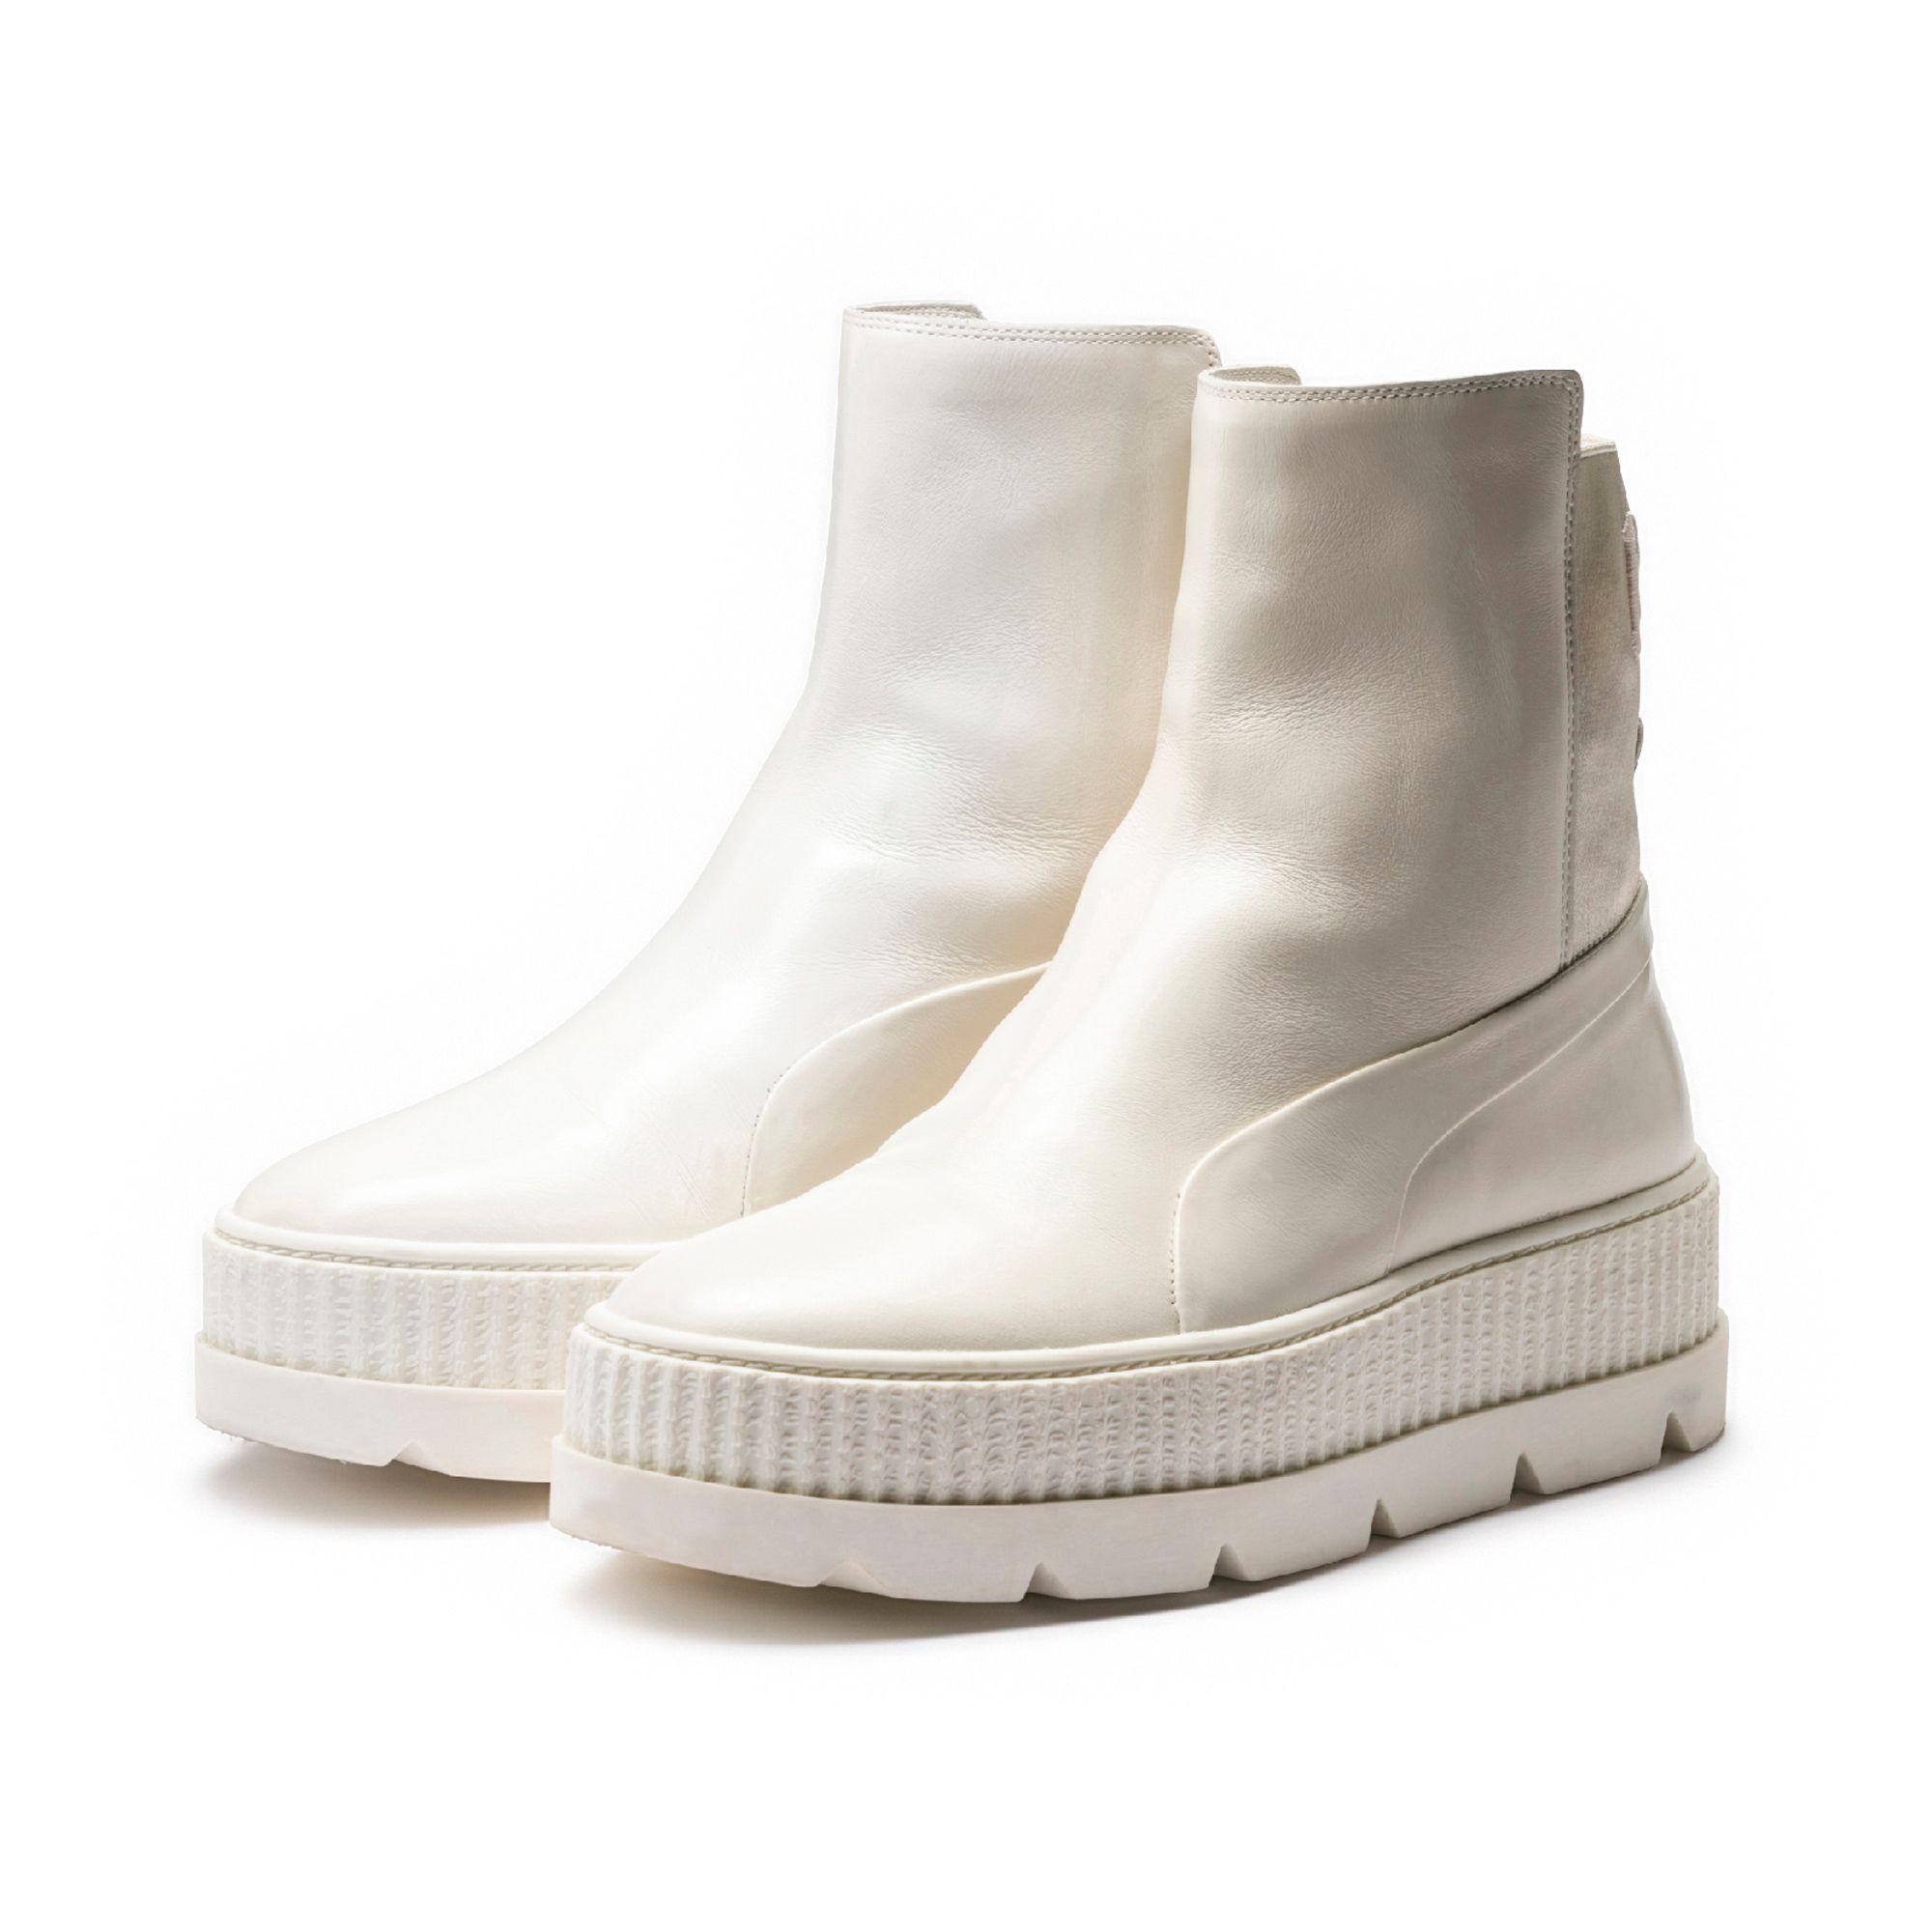 sale retailer af990 2228b PUMA Multicolor Fenty Men's Chelsea Sneaker Boot for men